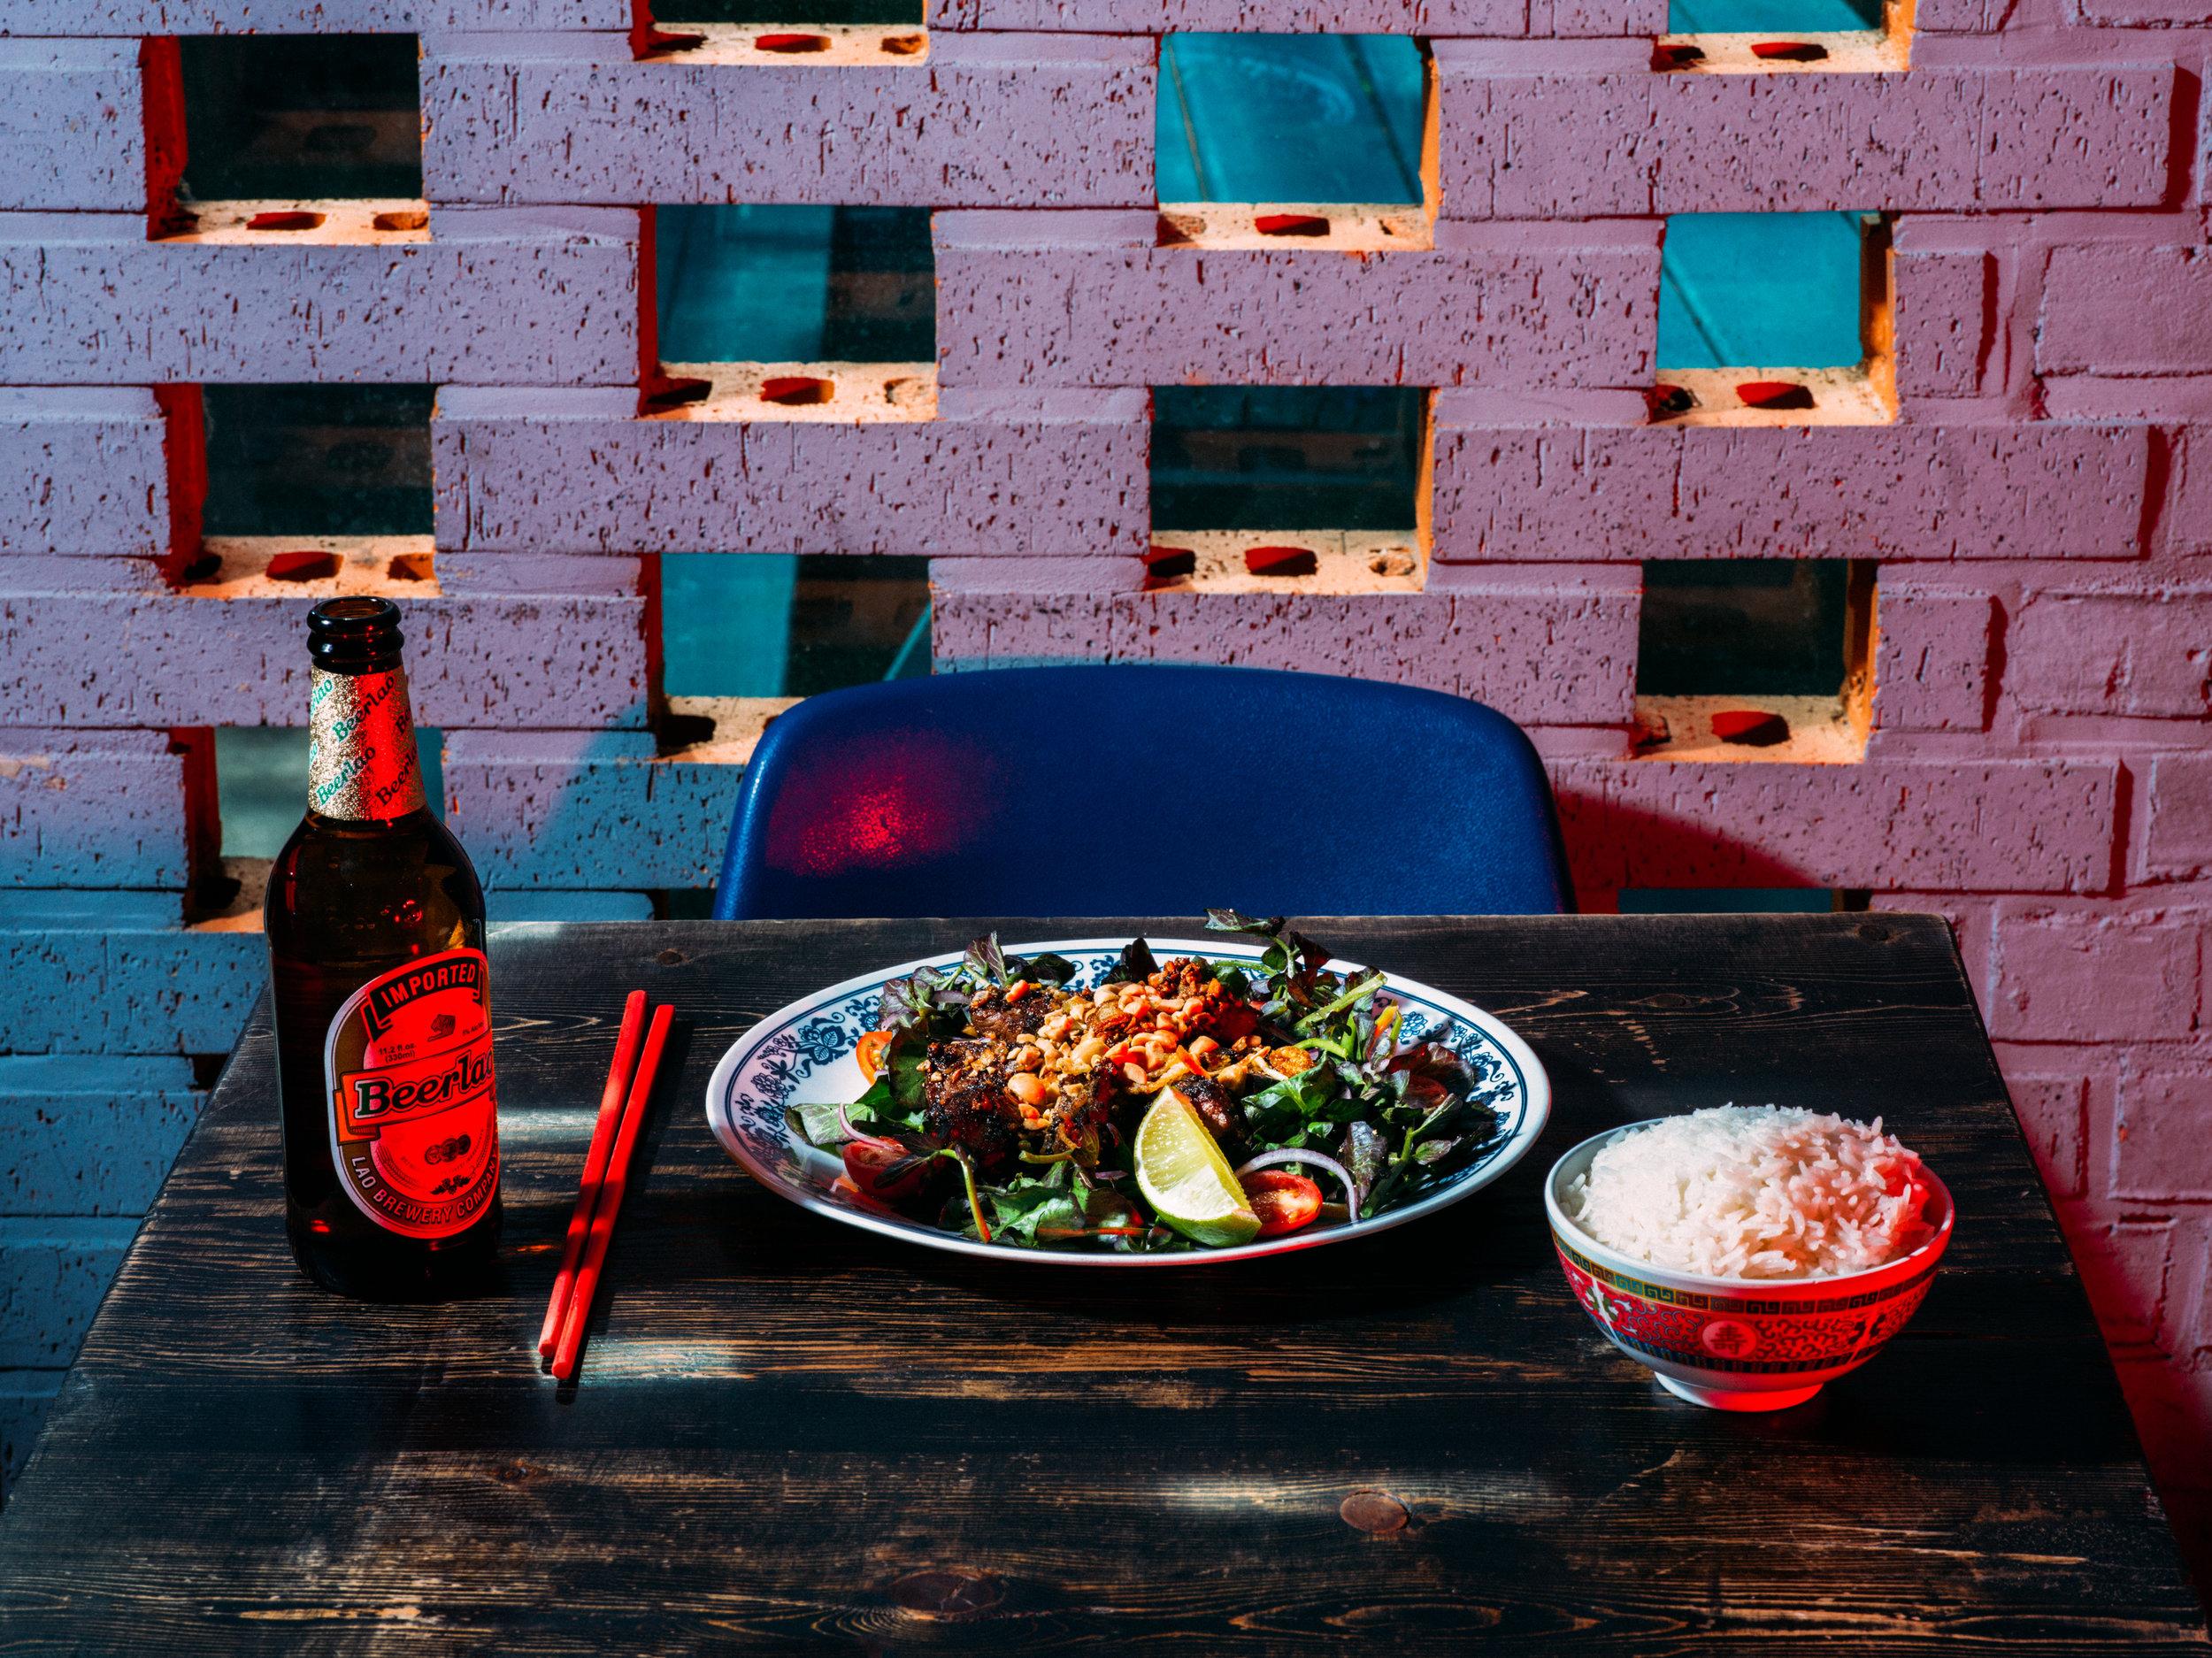 Bunker-Photography-All-Good-NYC-Food-19.jpg